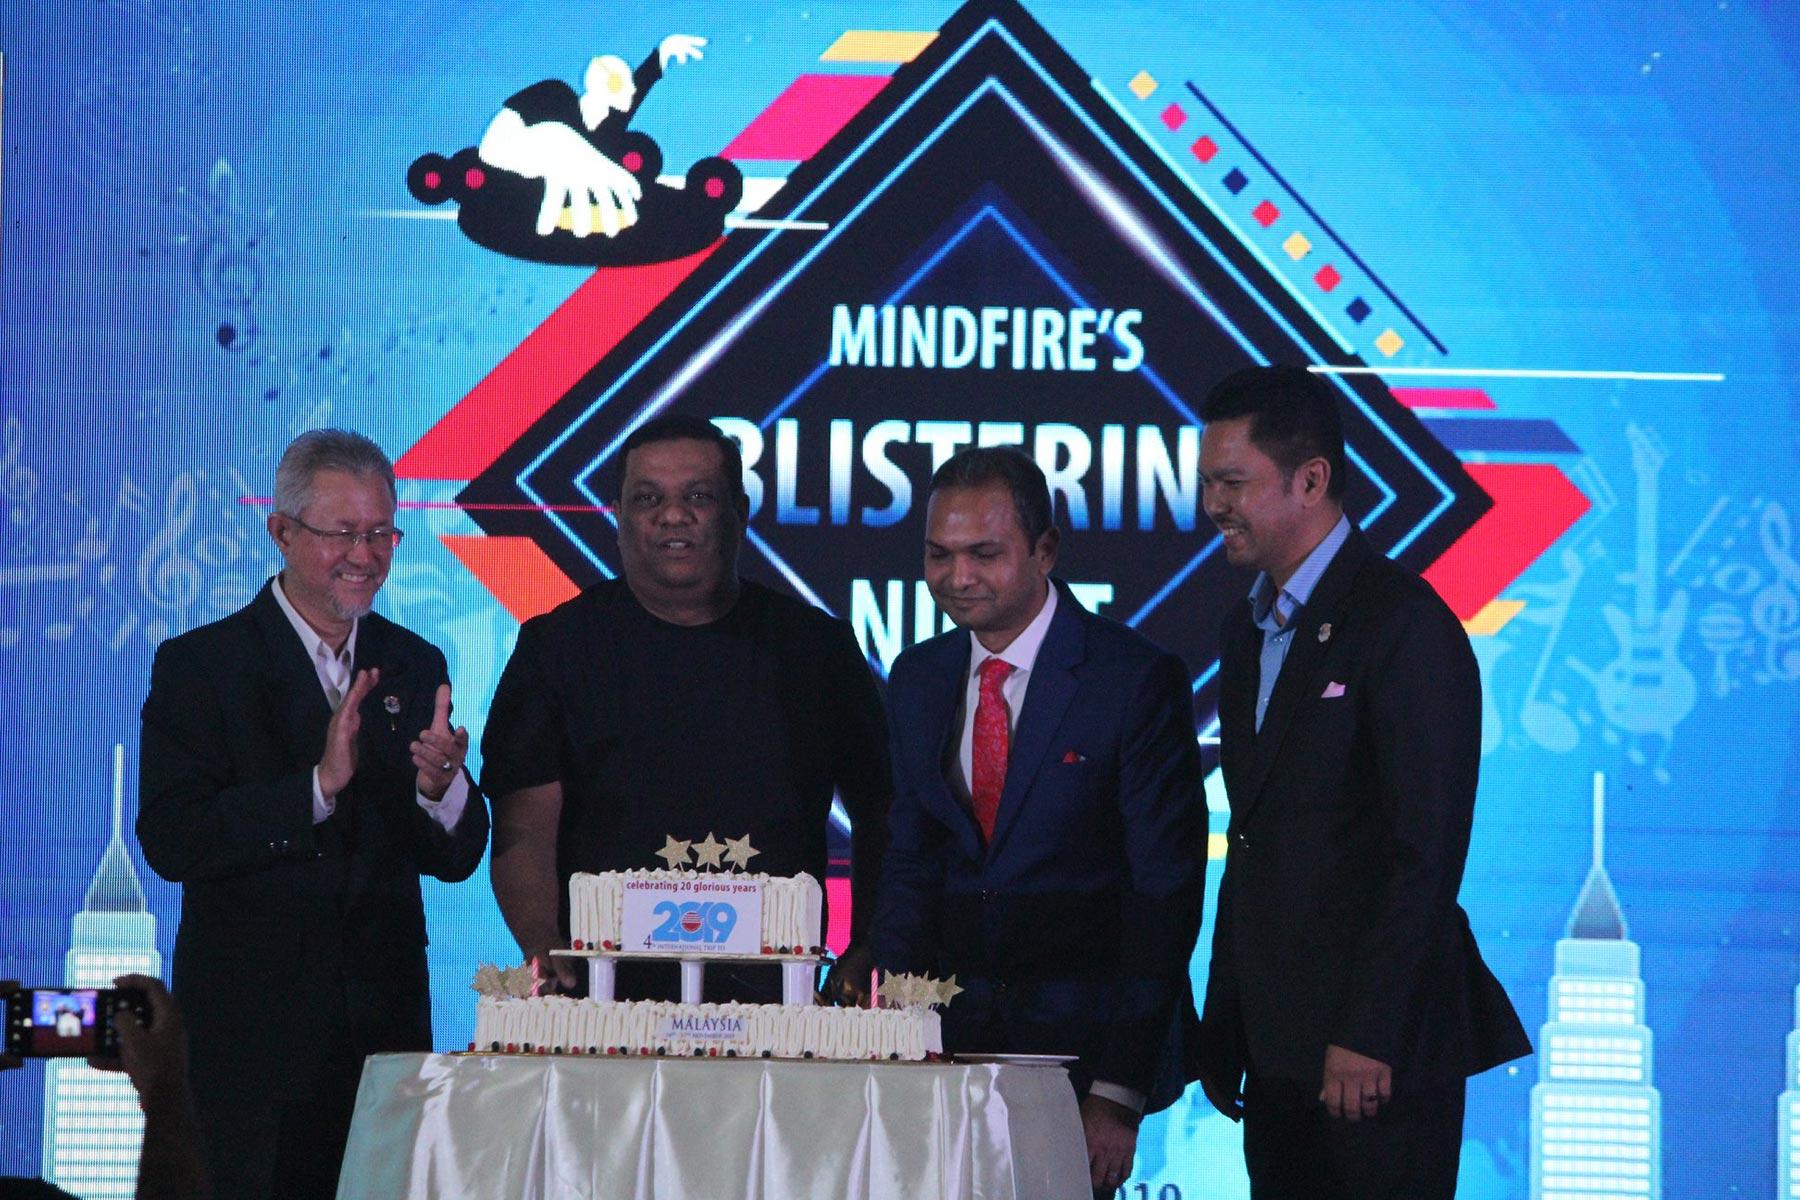 20th Year Anniversary Celebration at Malaysia